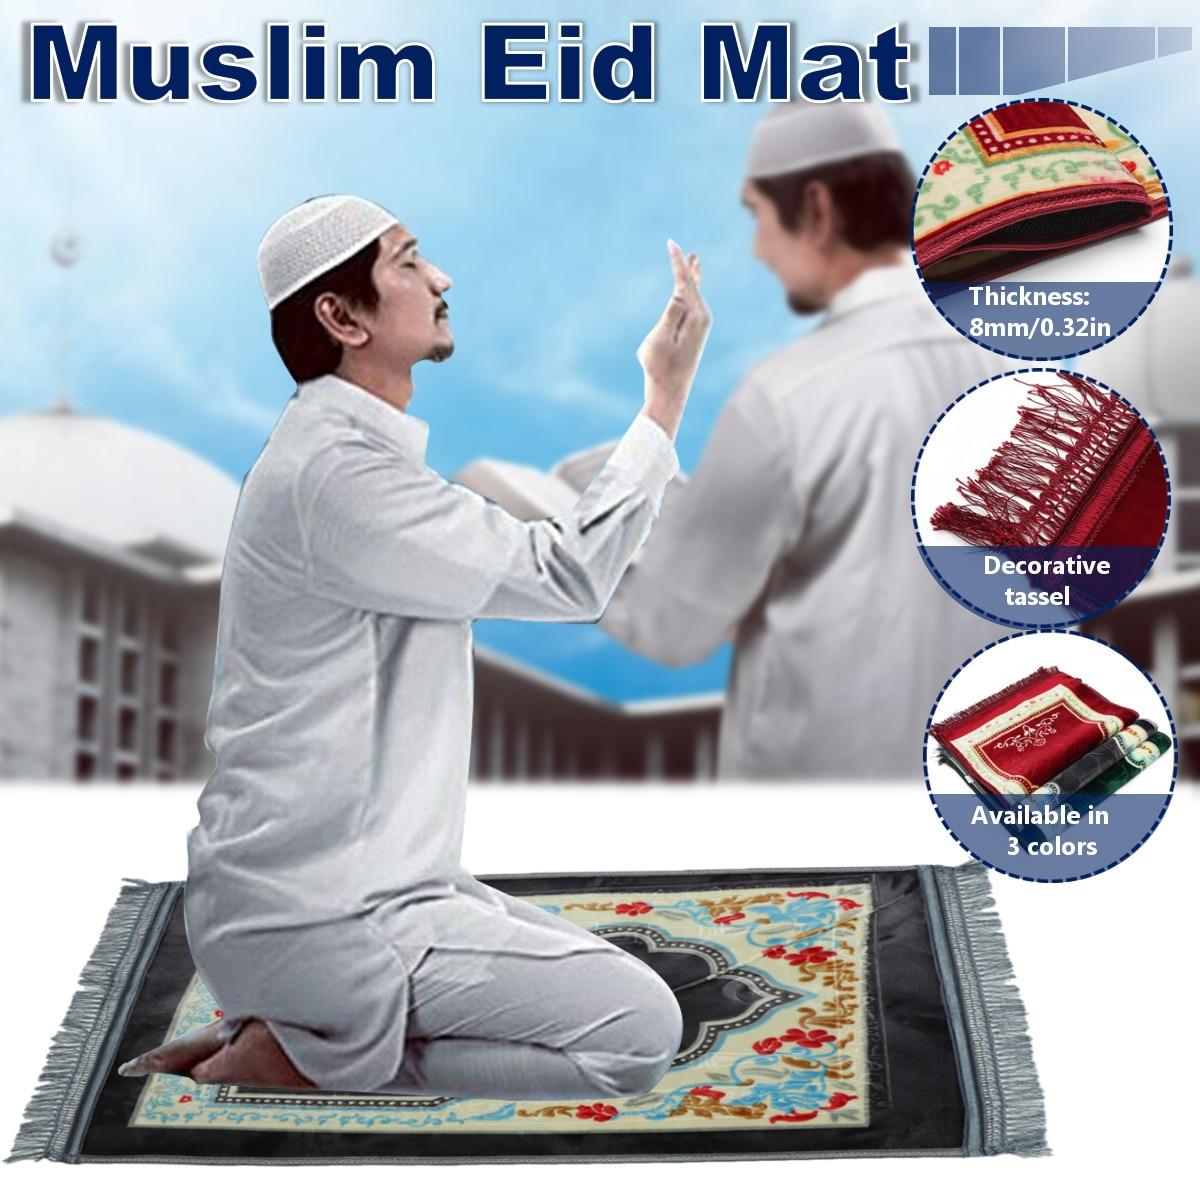 80X120cm Prayer Mat Muslim Cashmere-like Thicken Blanket Salat Musallah Prayer Rug Namaz Islamic Praying Mats